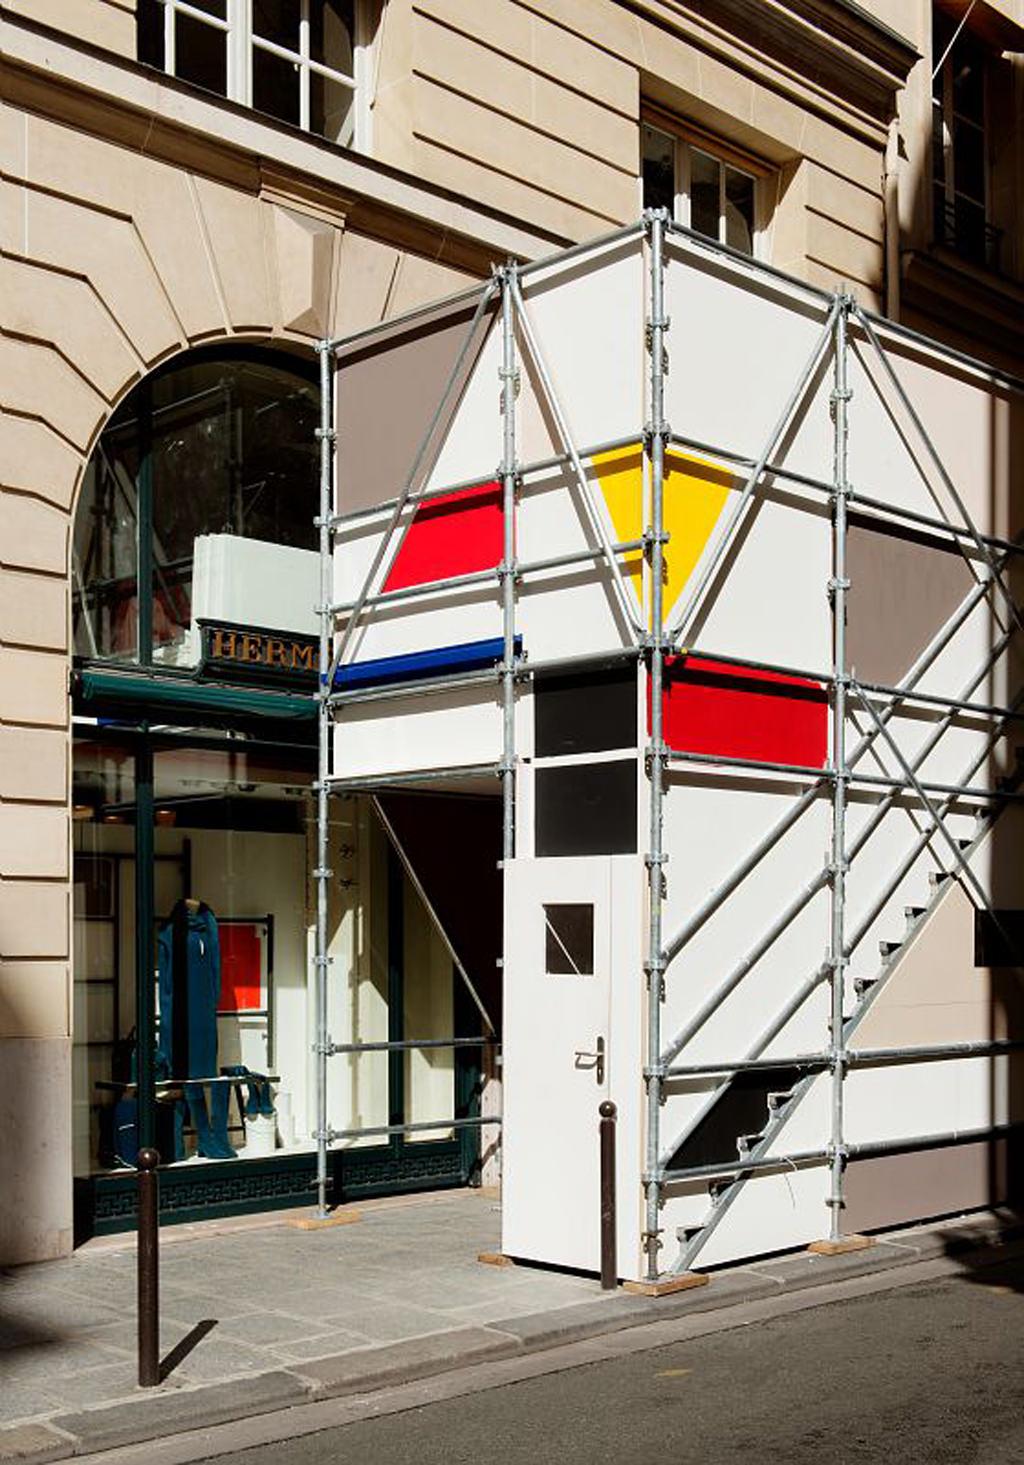 24 Faubourg Saint-Honore, Paris, automne 2015 Petite vitrine